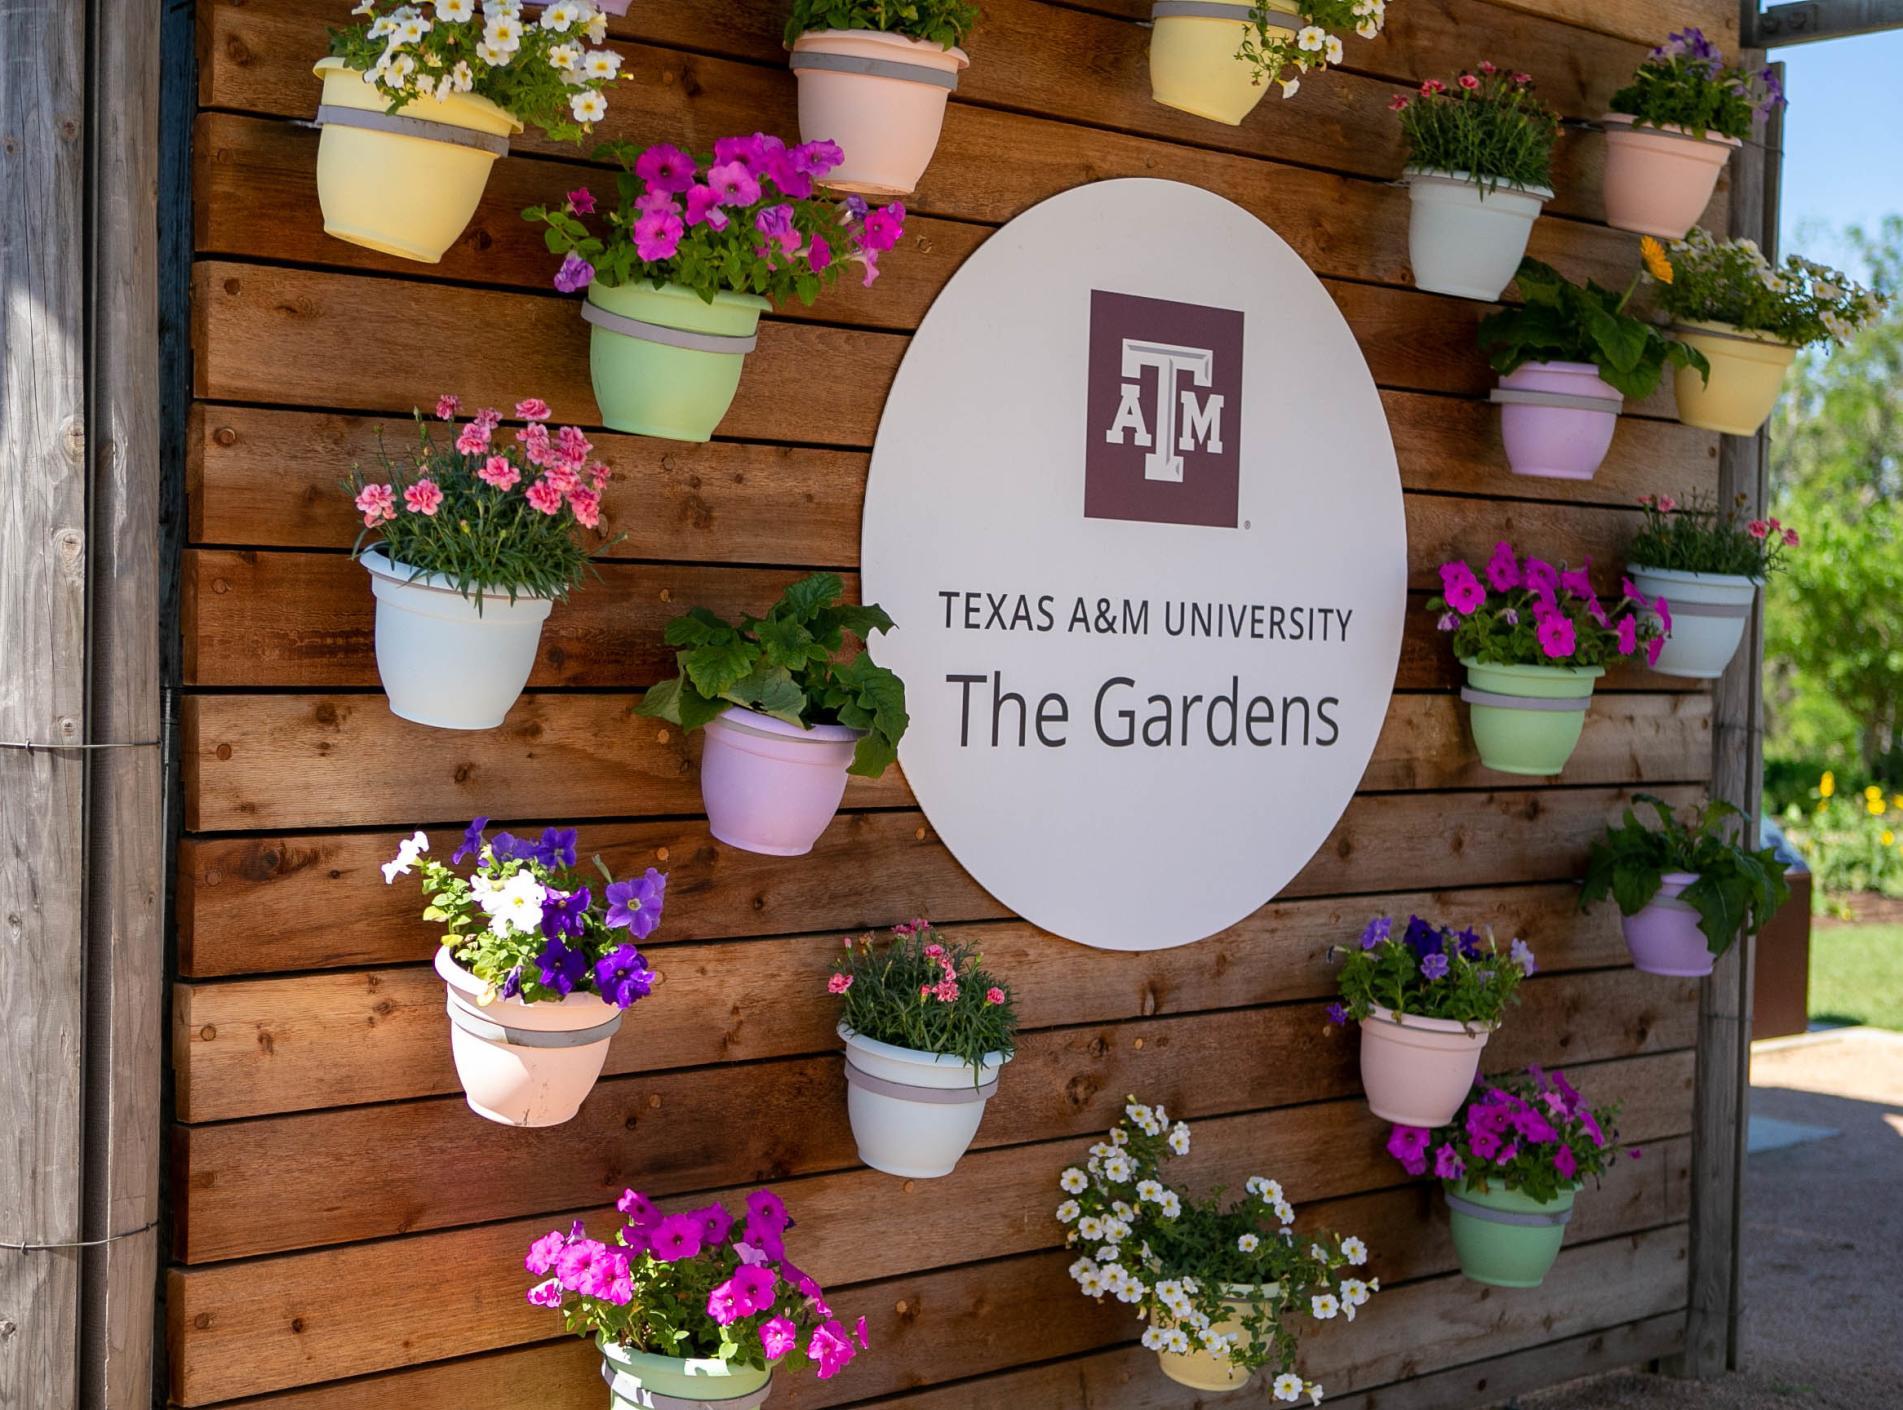 The Gardens at Texas A&M